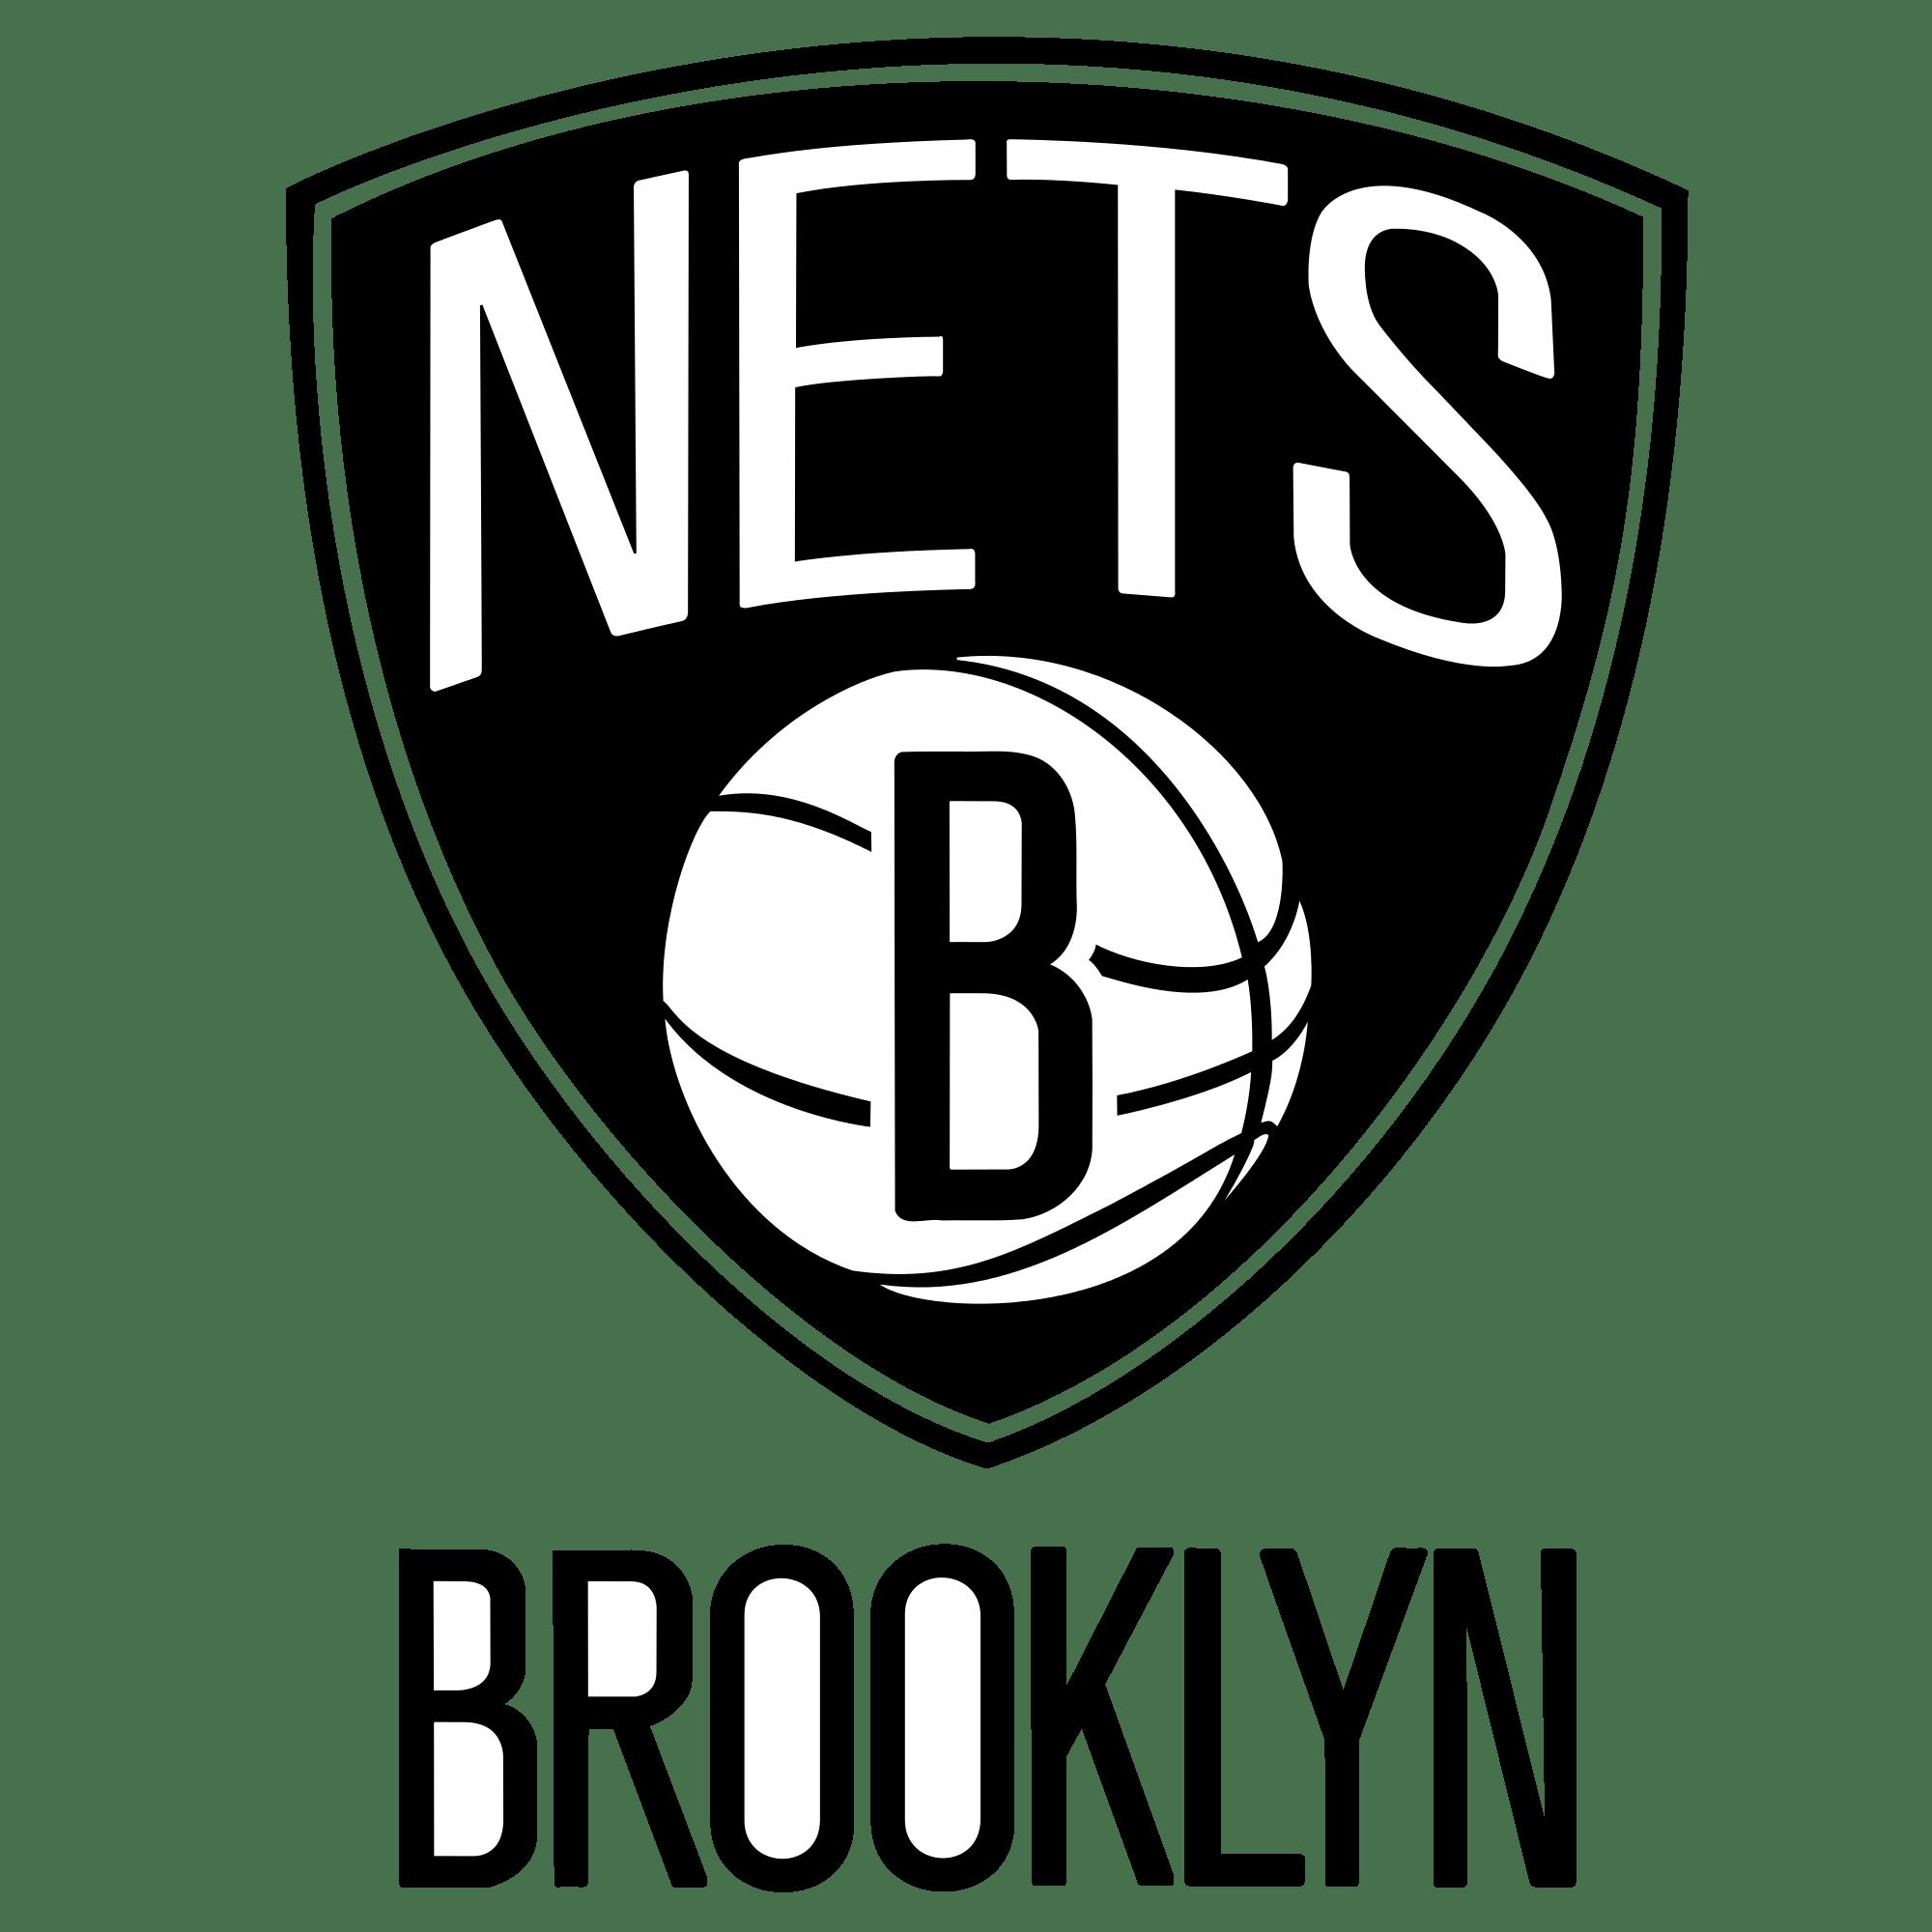 Brooklyn Nets Logo Transparent Png Stickpng